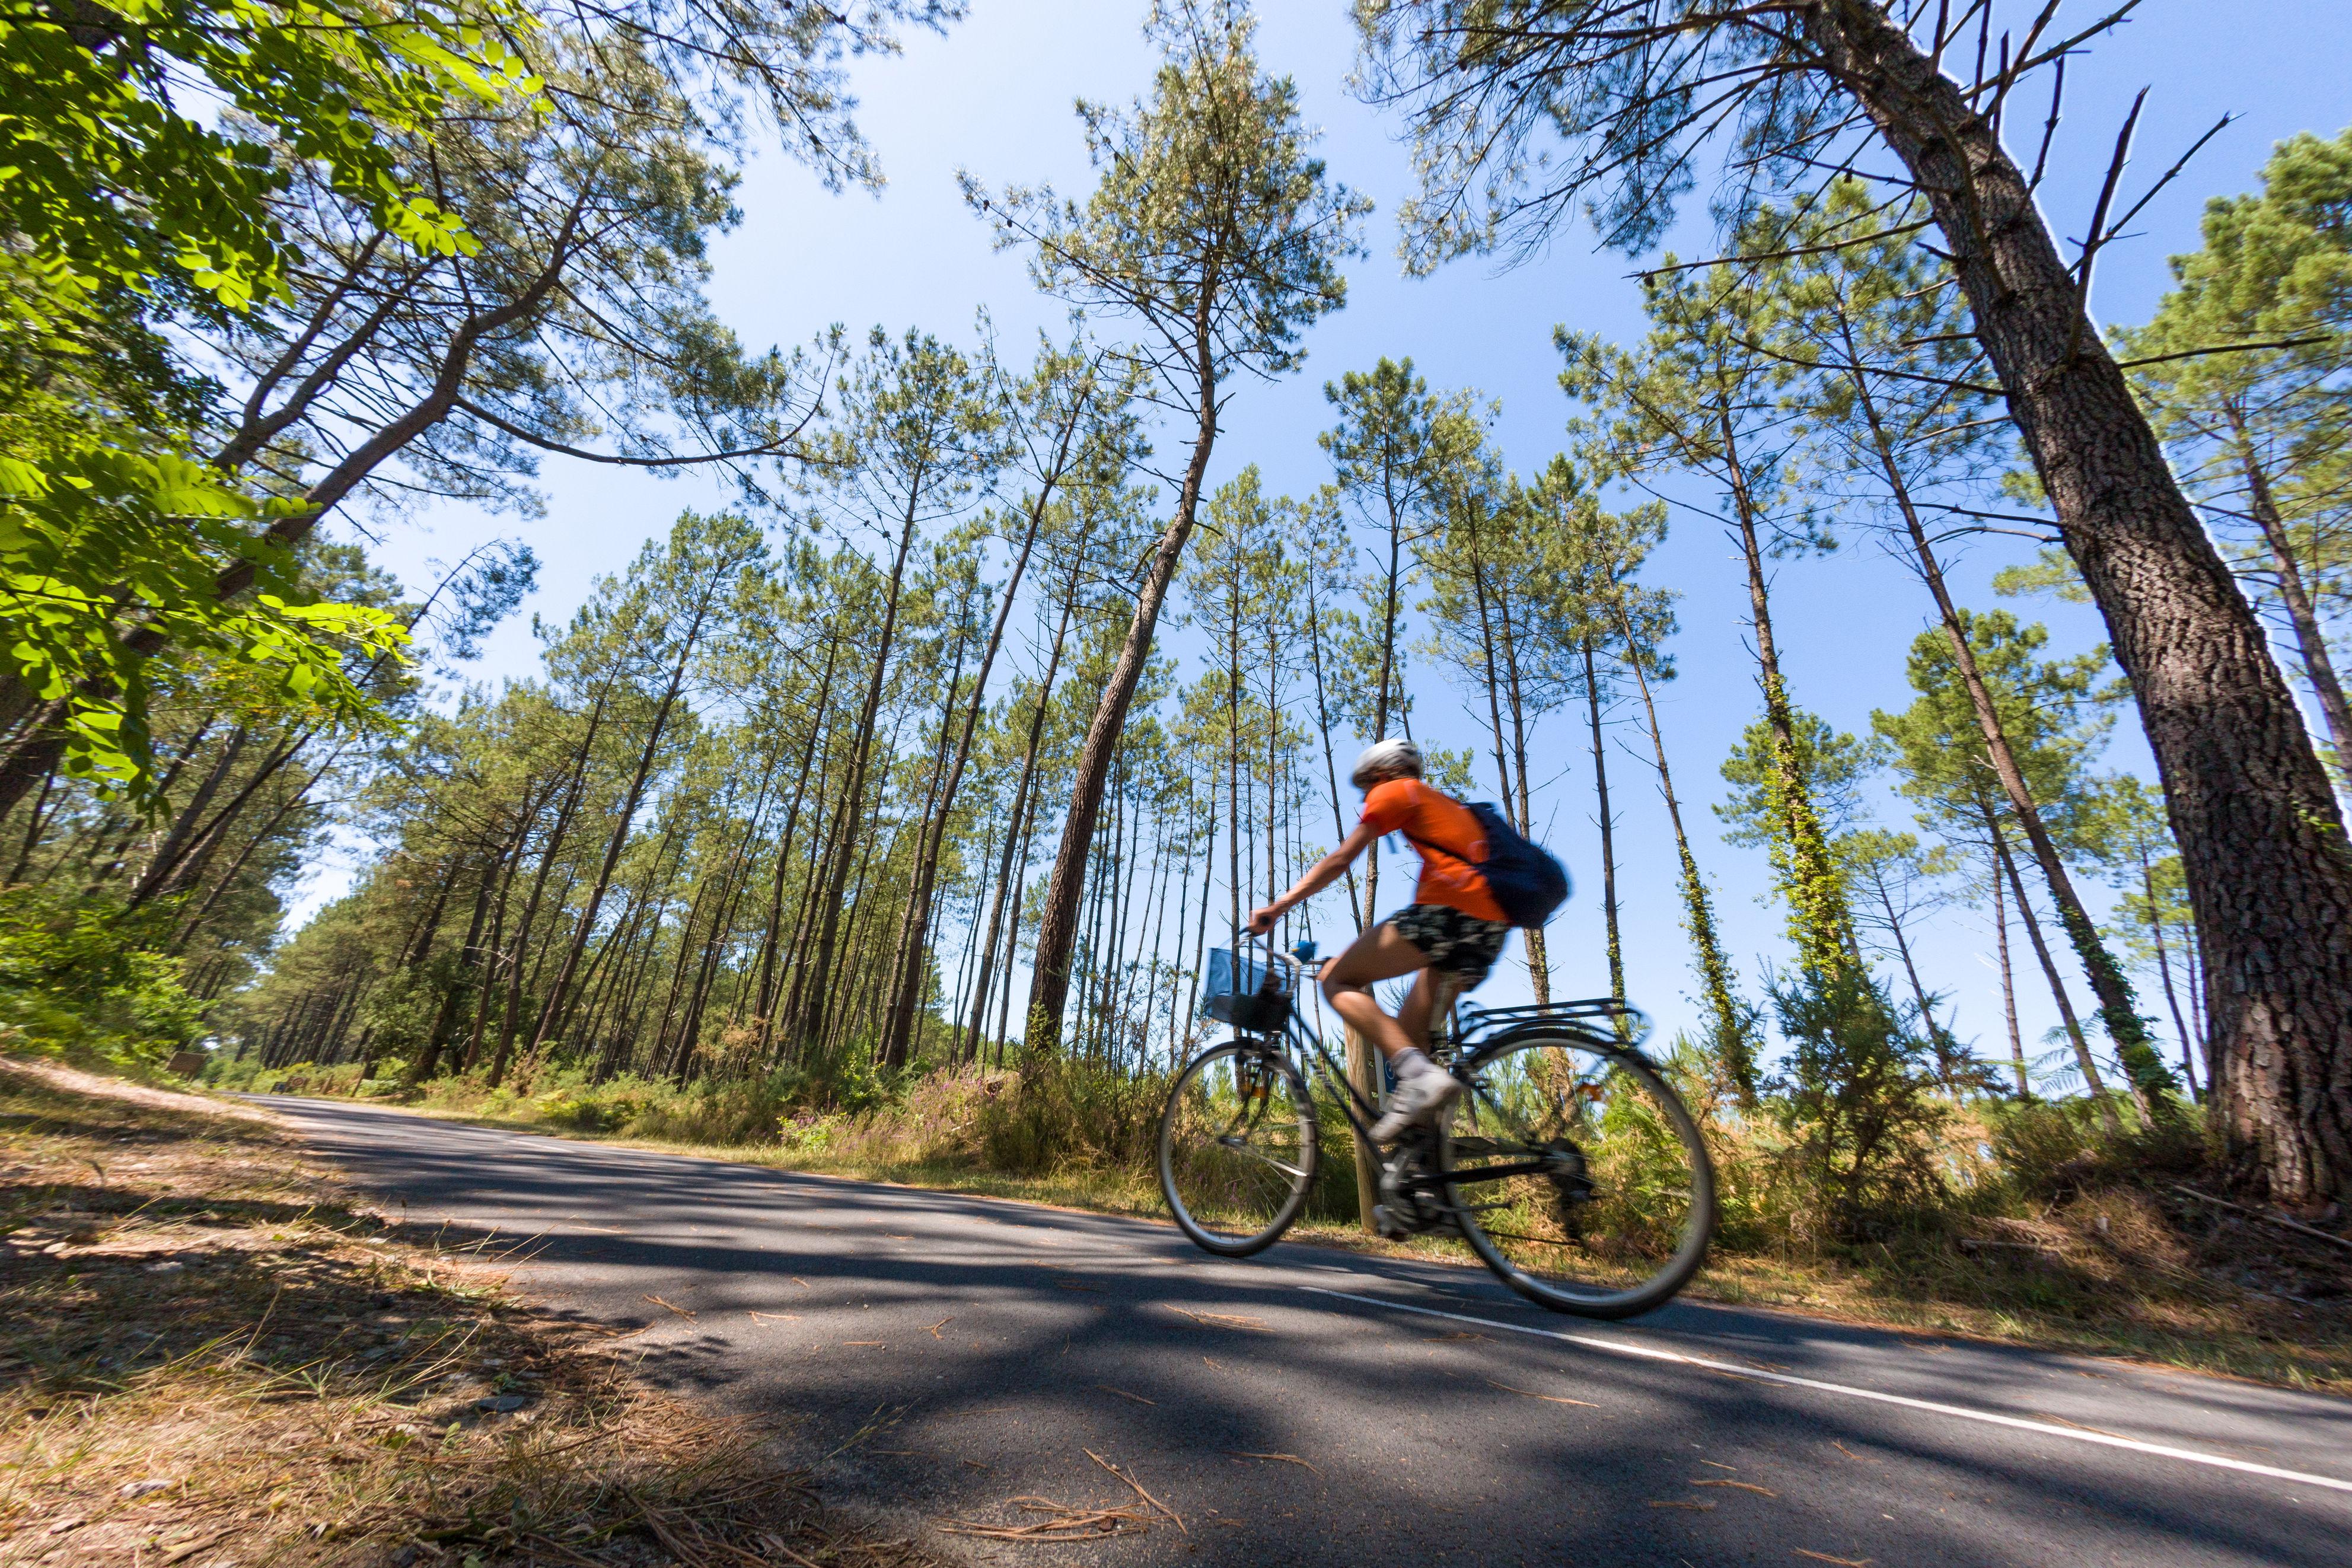 Cyclisme_Piste